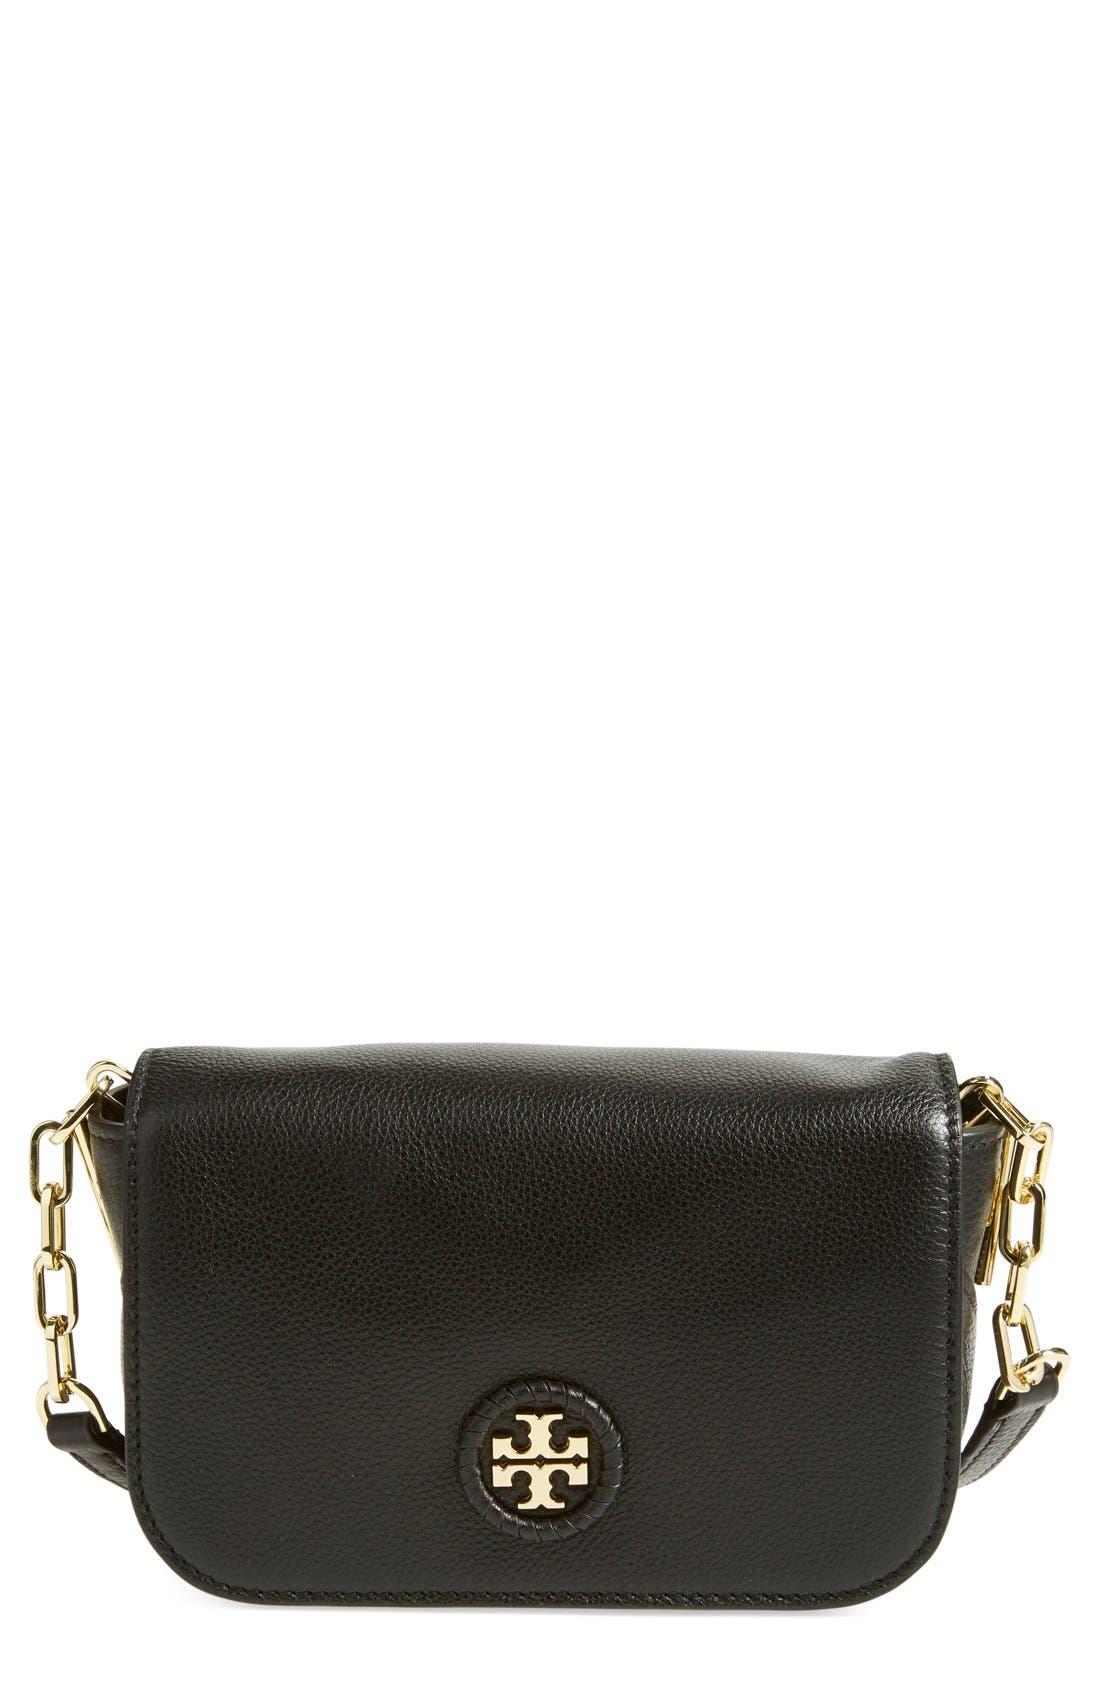 TORY BURCH Mini Leather Crossbody Bag, Main, color, 001